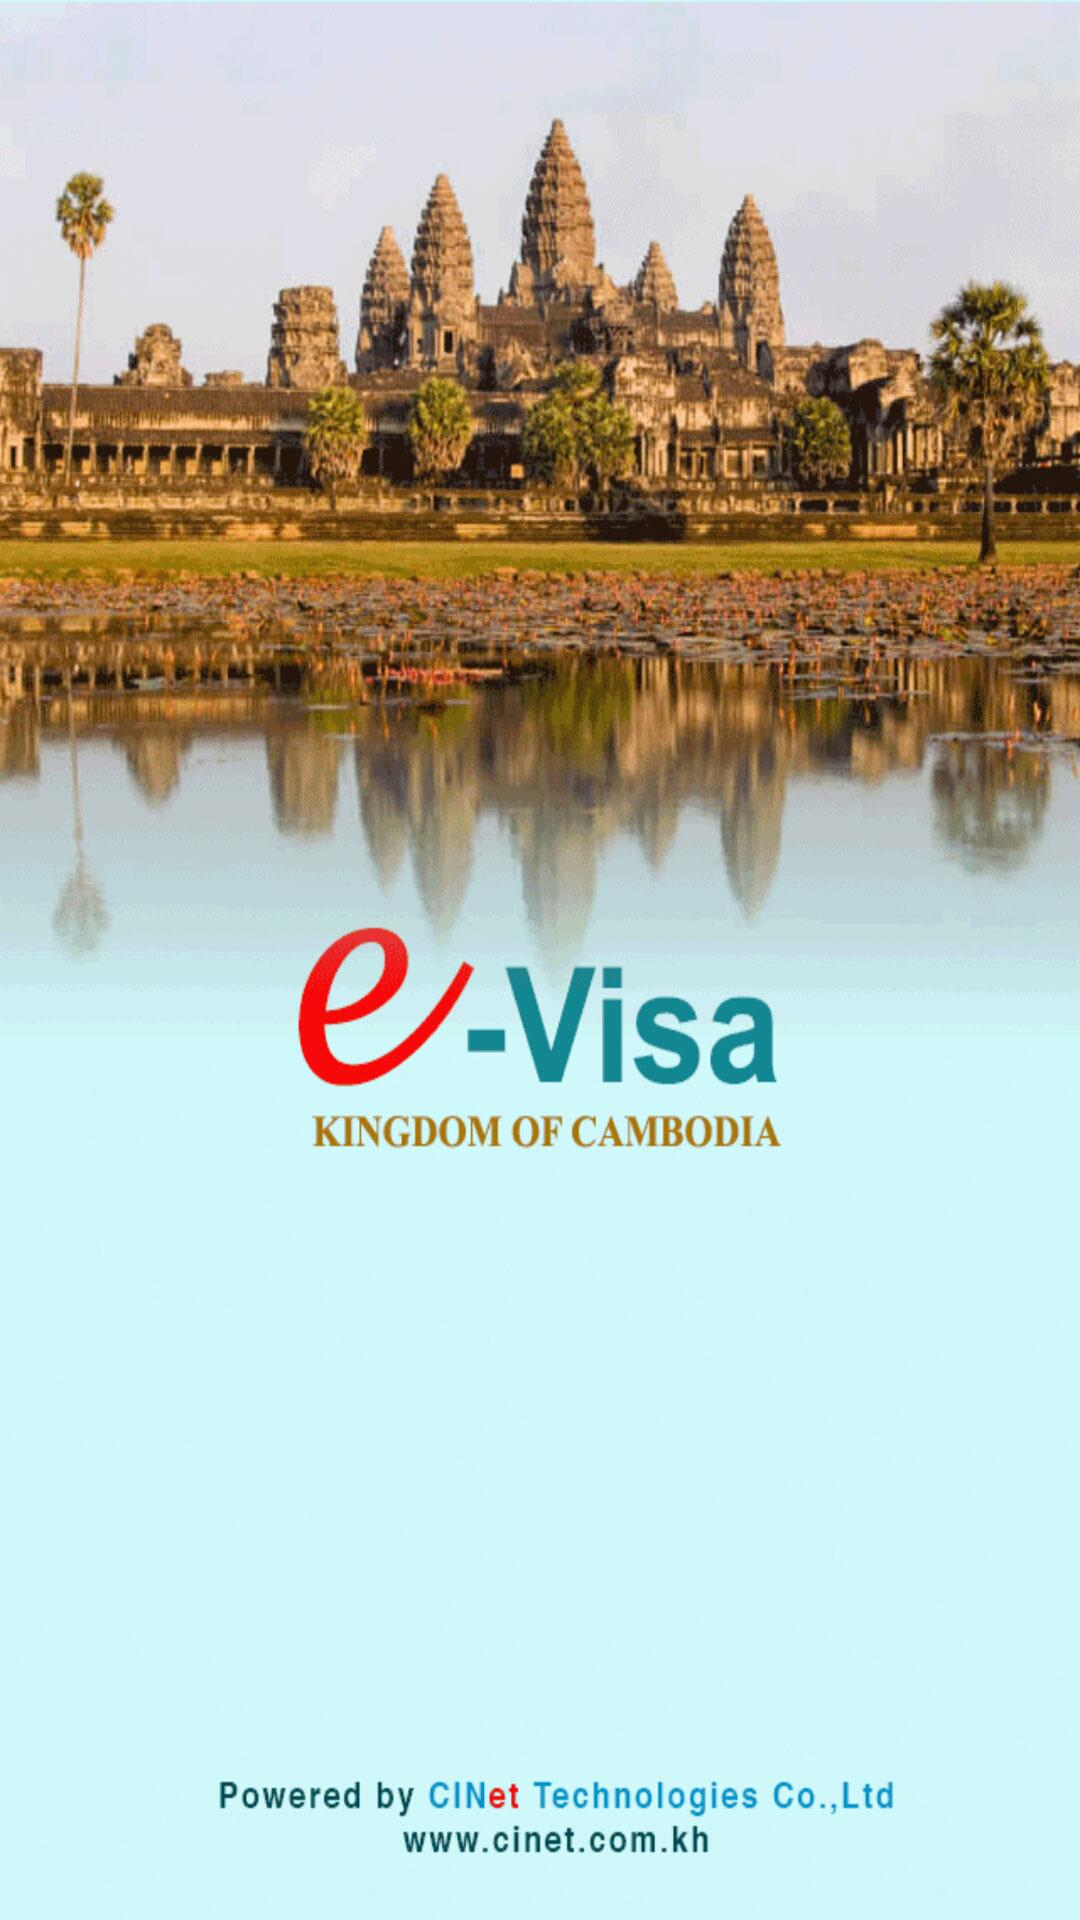 e-Visaアプリの起動画面